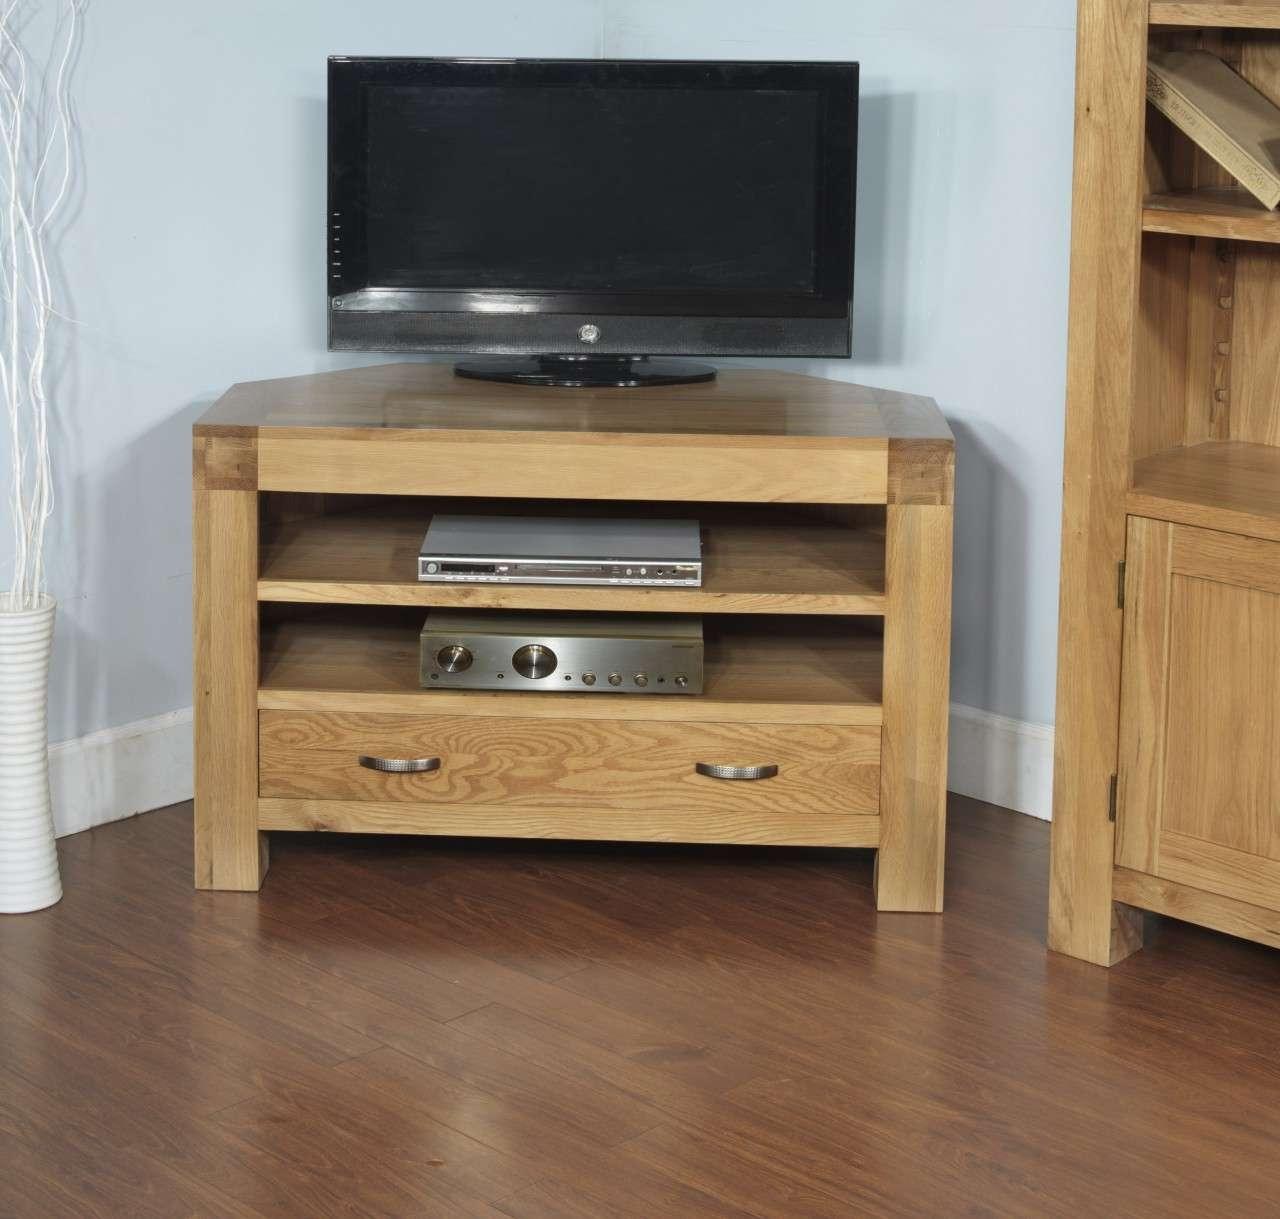 Rivermead Solid Oak Modern Furniture Widescreen Corner Tv Cabinet Inside Oak Corner Tv Stands (View 11 of 15)